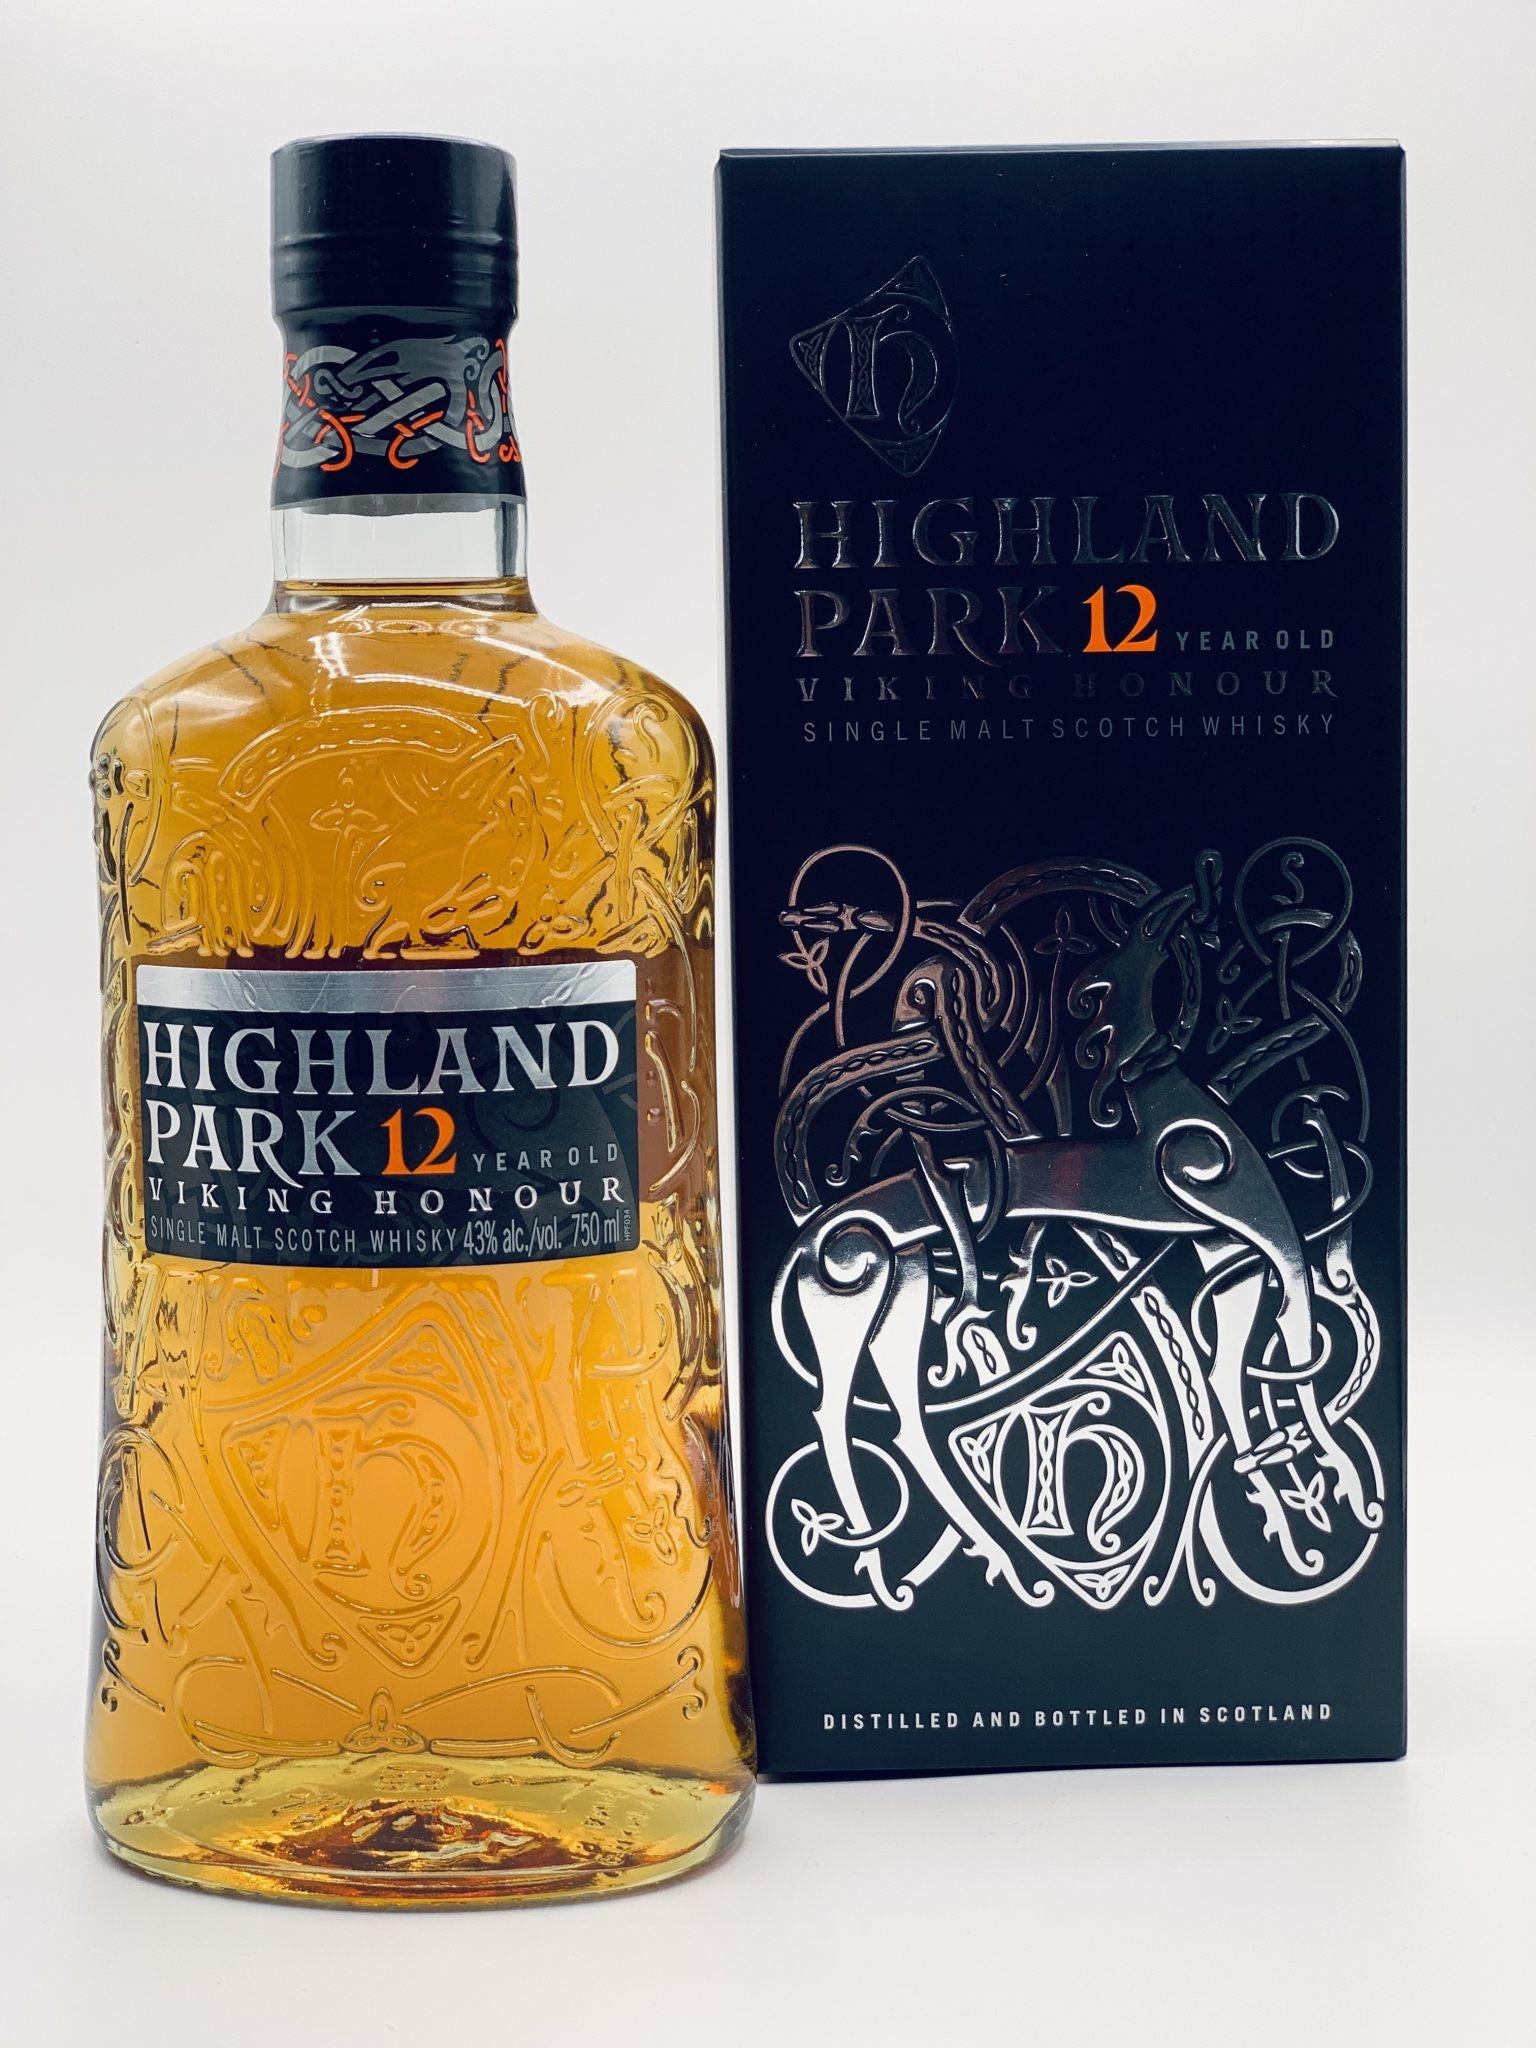 Highland Park 12yr Orkney Single Malt Scotch Whisky  750ml (86 proof)